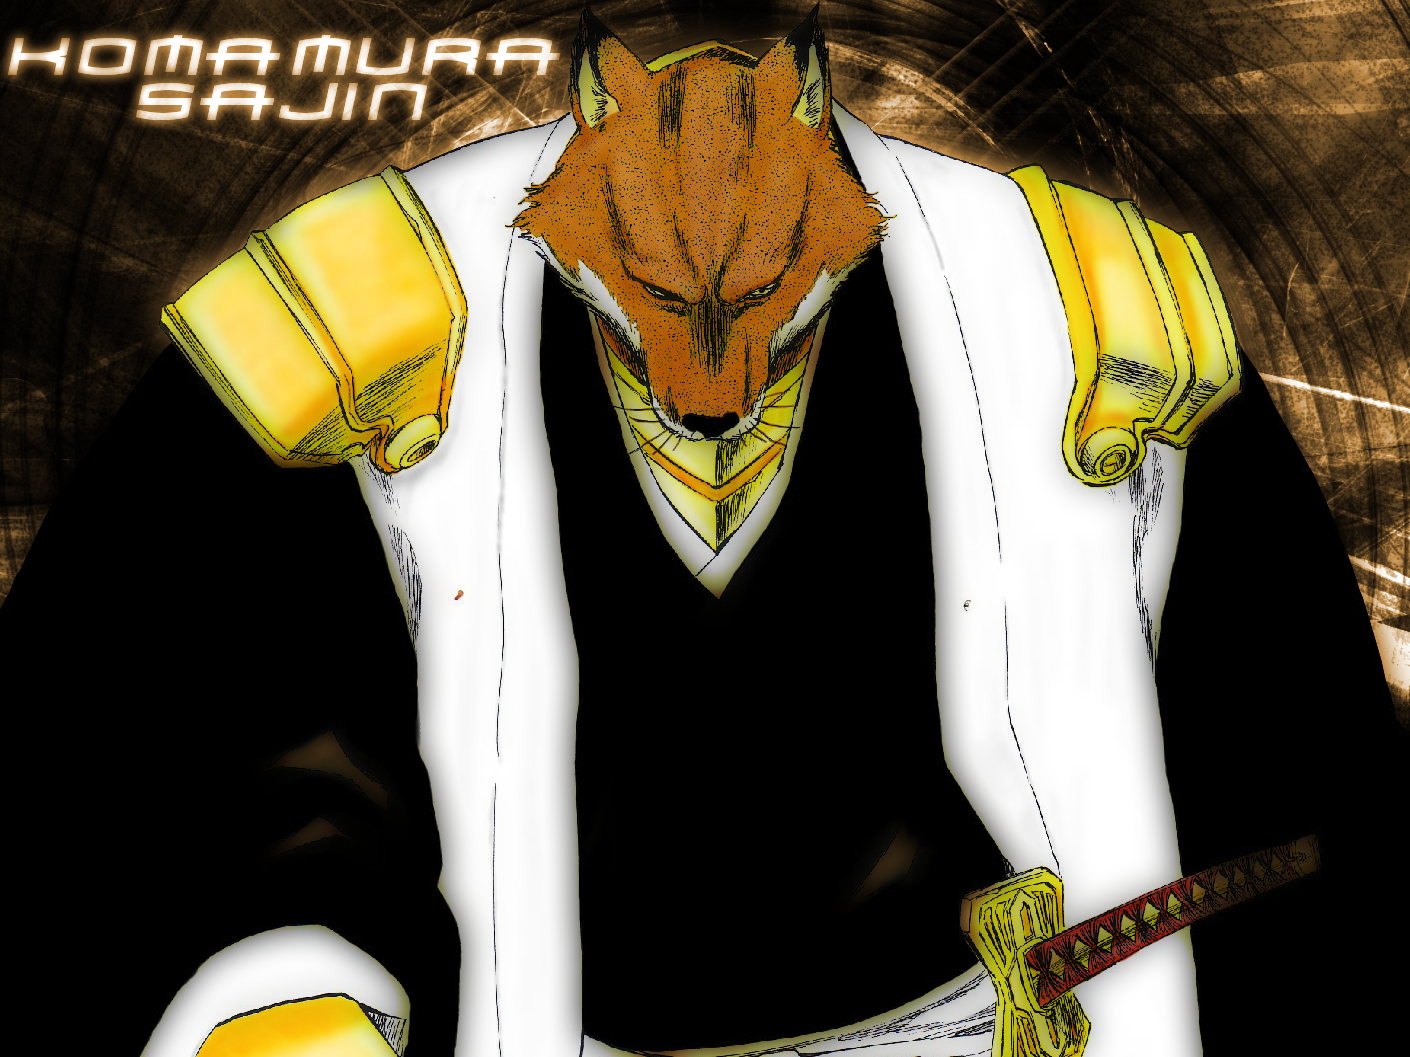 My Favorite Bleach Character Komamura_Sajin___Wallpaper_by_cyberrob50